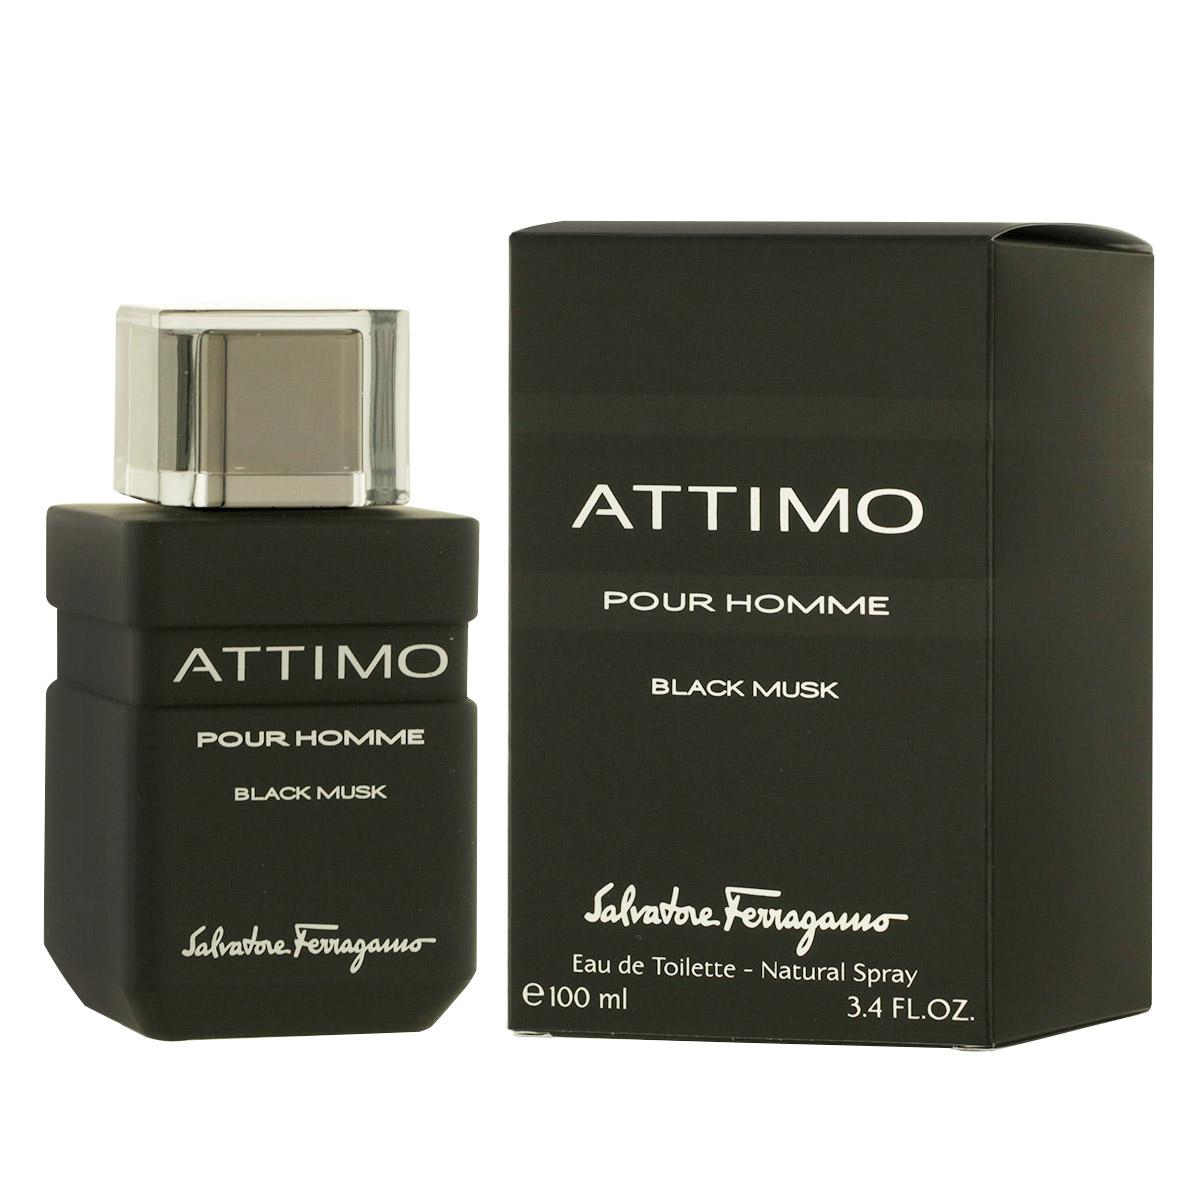 Salvatore Ferragamo Attimo Black Musk Pour Homme EDT 100 ml M